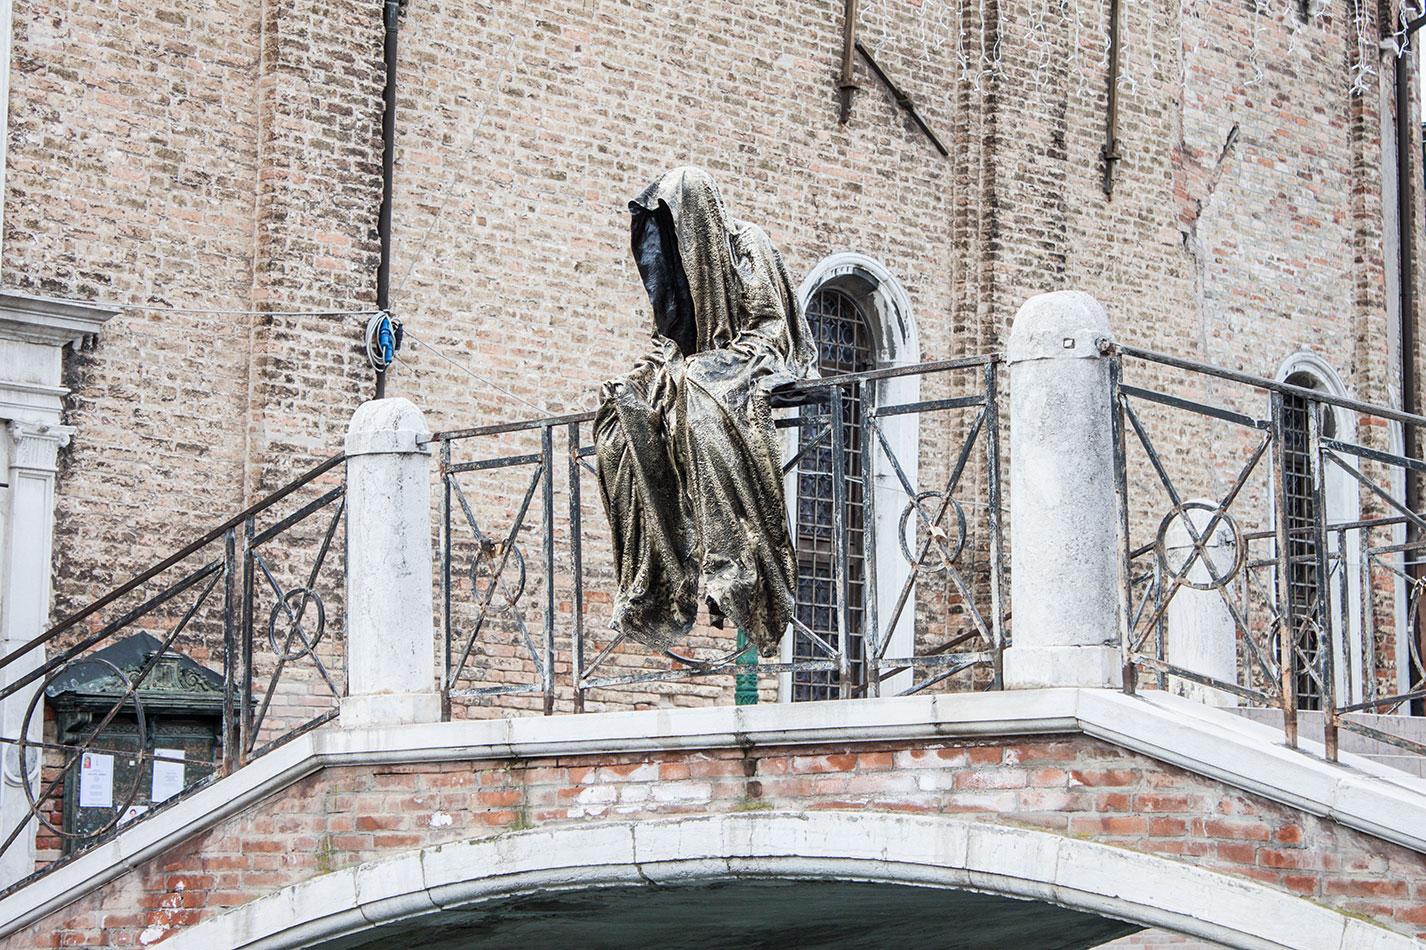 biennale-art-italia-venice-murano-glas-berengo-show-guardians-of-time-manfred-kielnhofer-public-contemporary-art-sculpture-design-7223